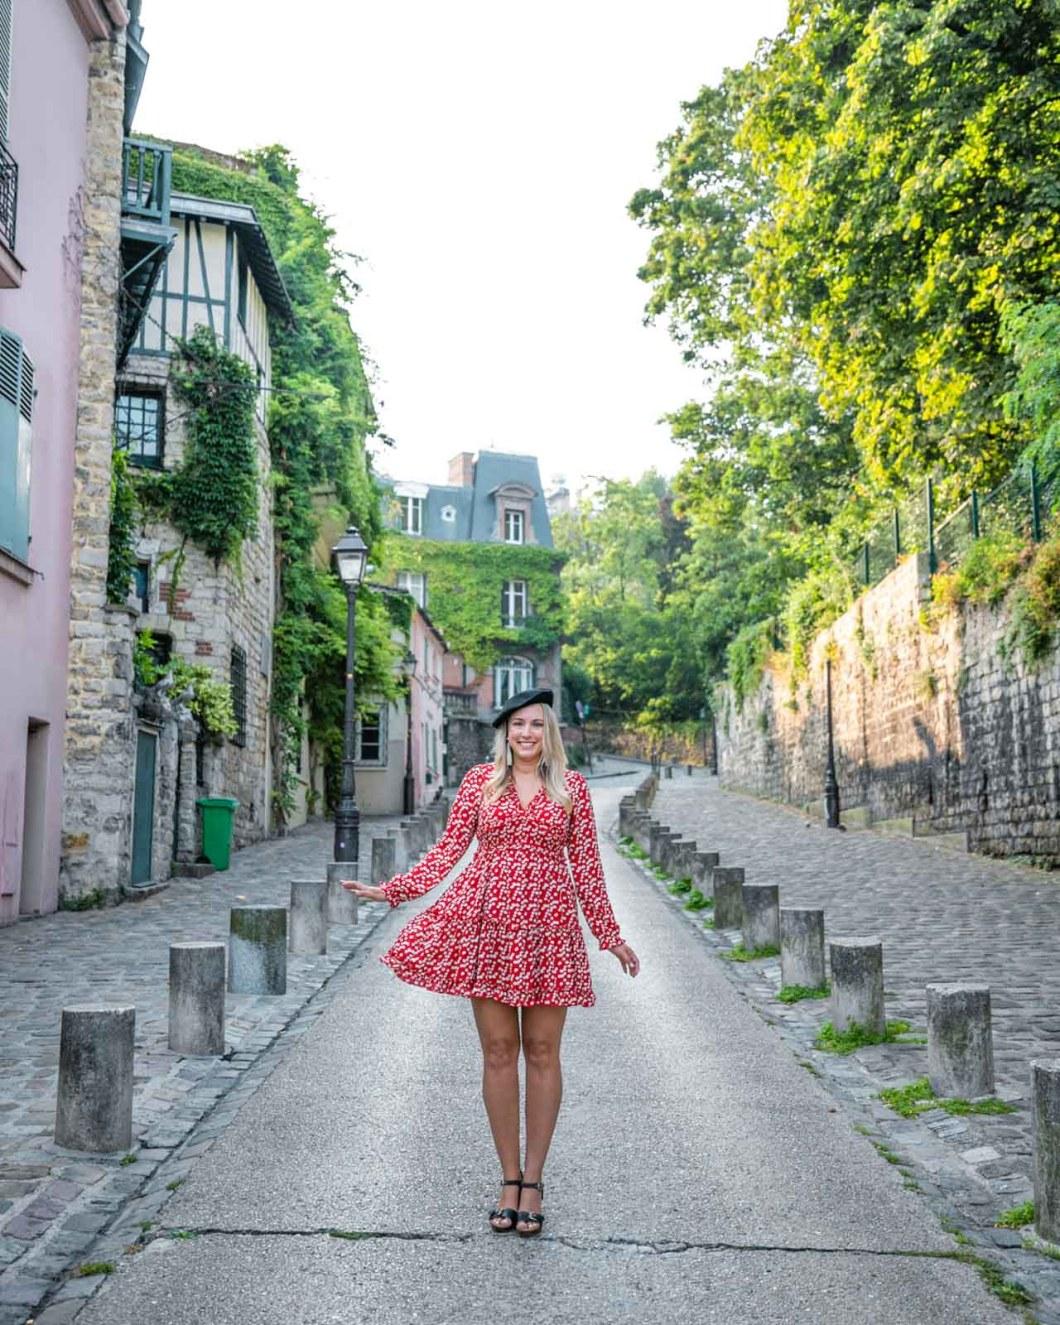 Photoshoot in Rue de l'Abreuvoir in Montmartre